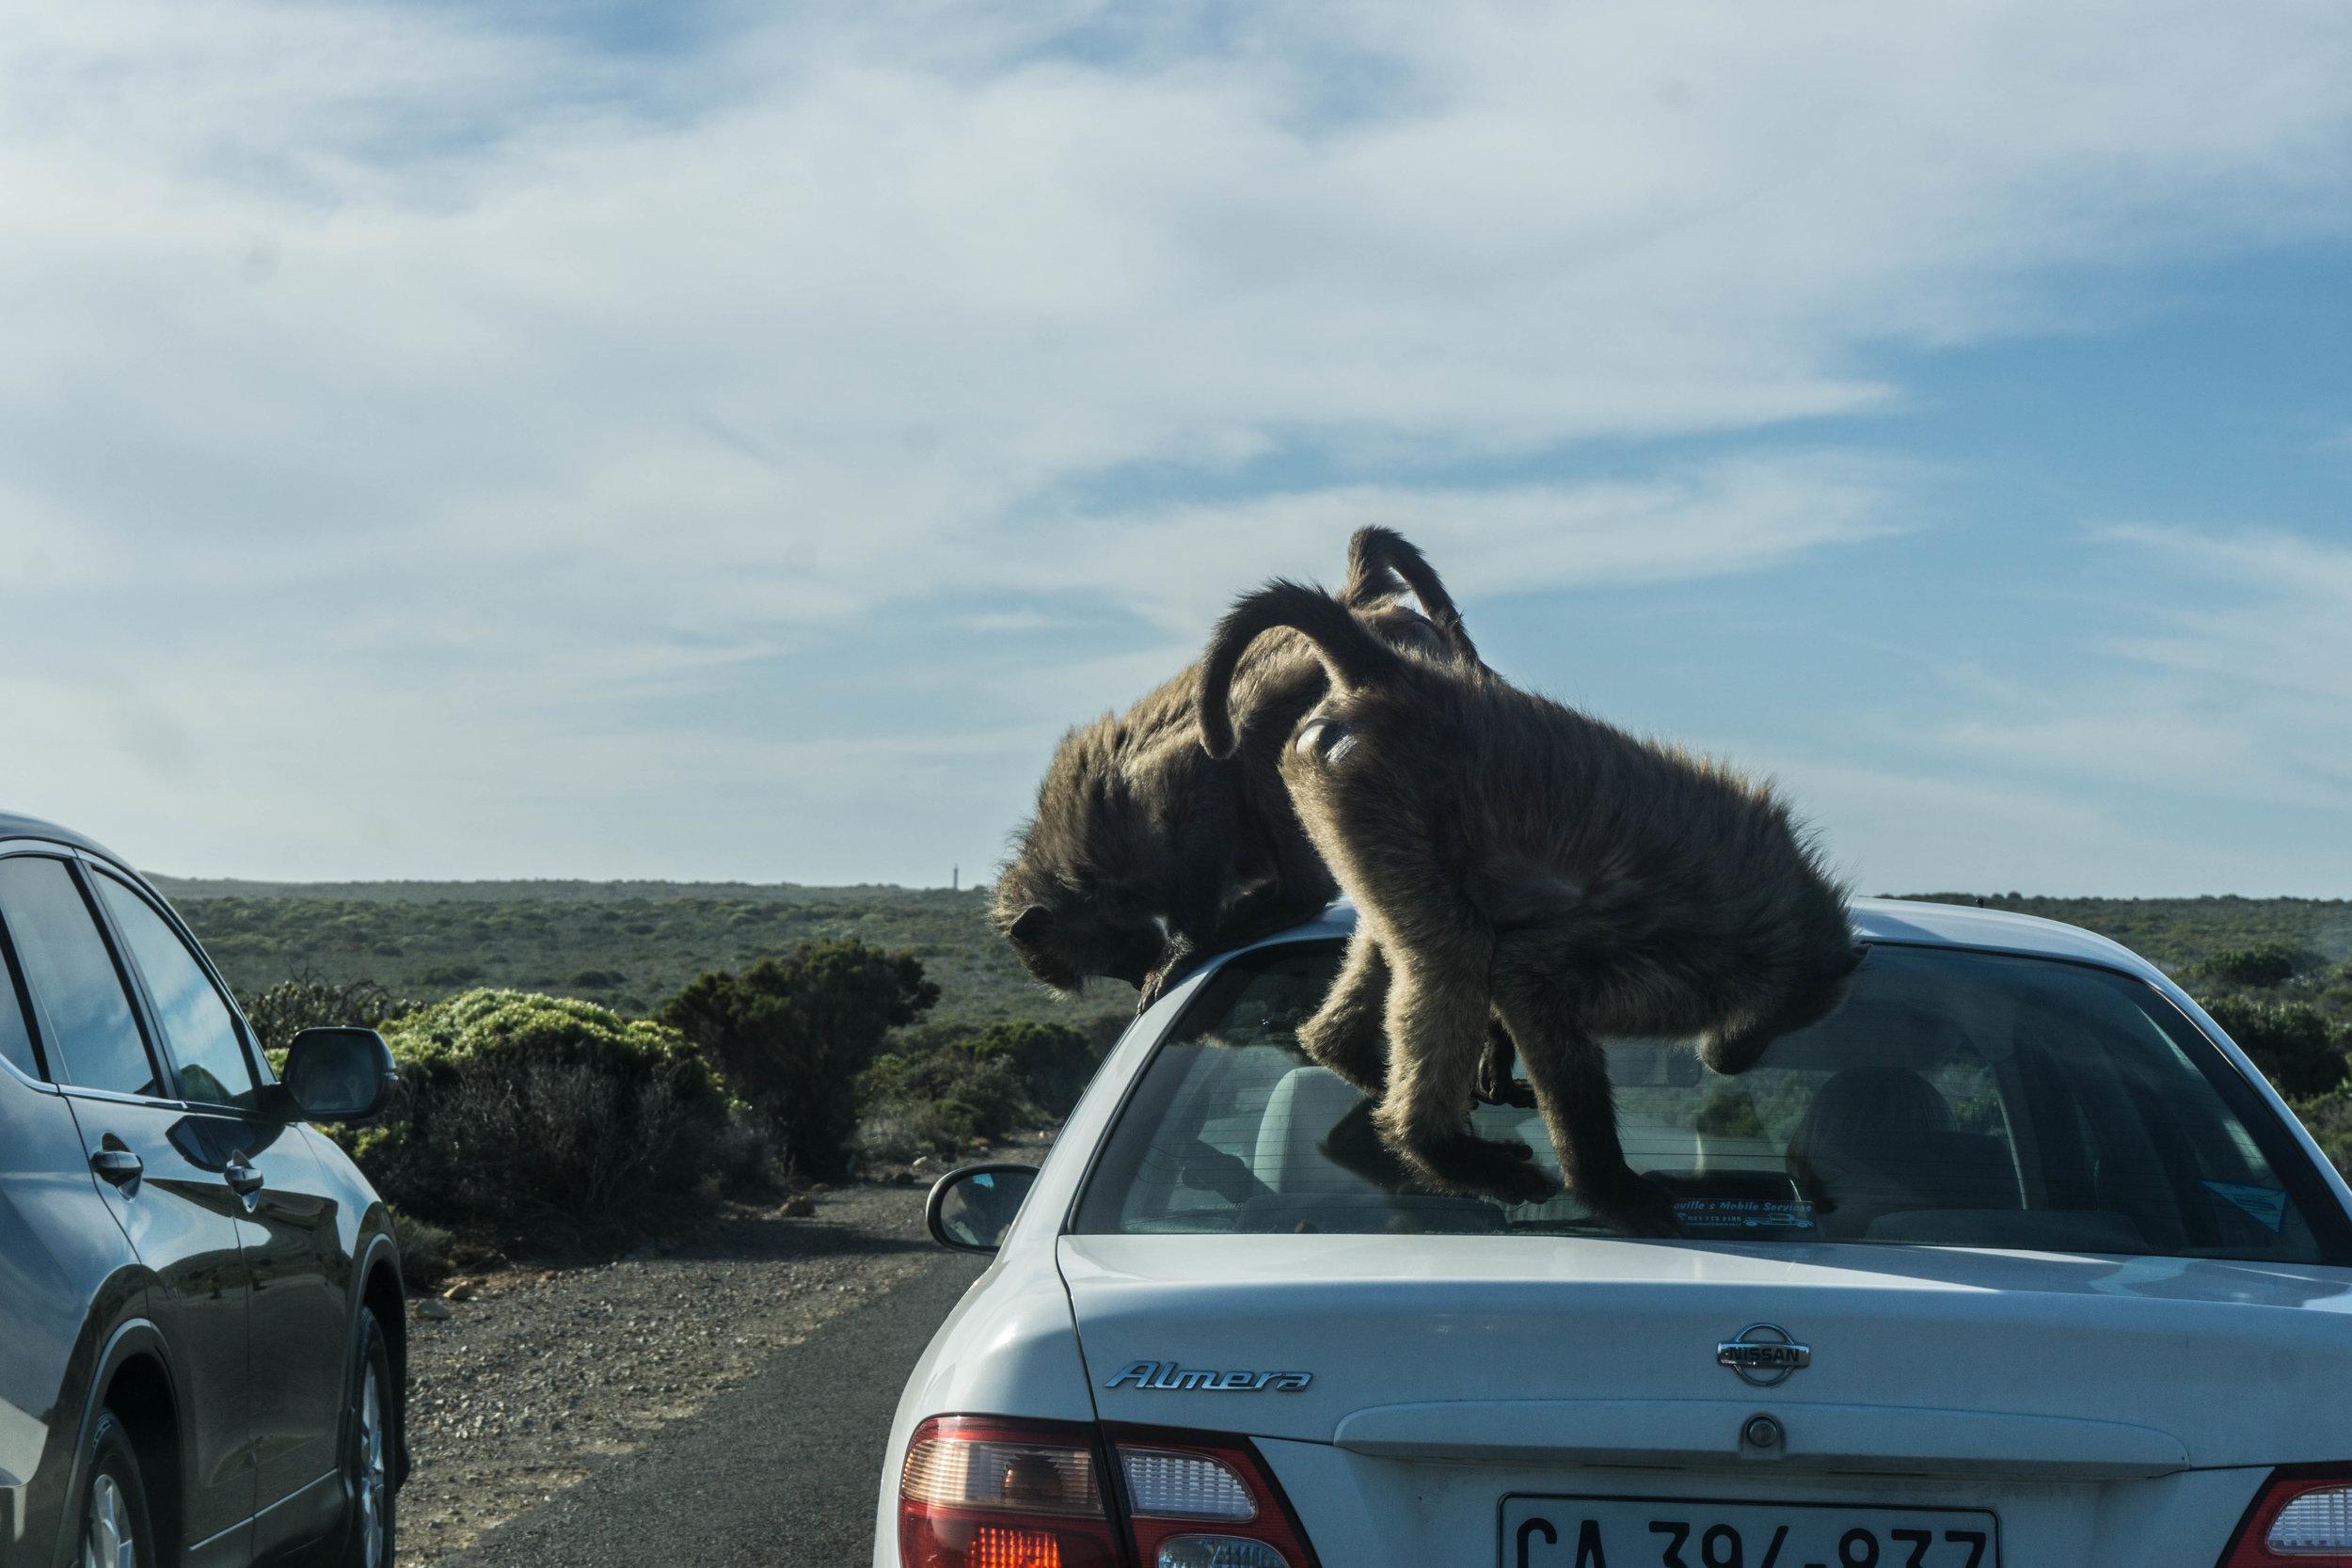 Monkeying around (ha)